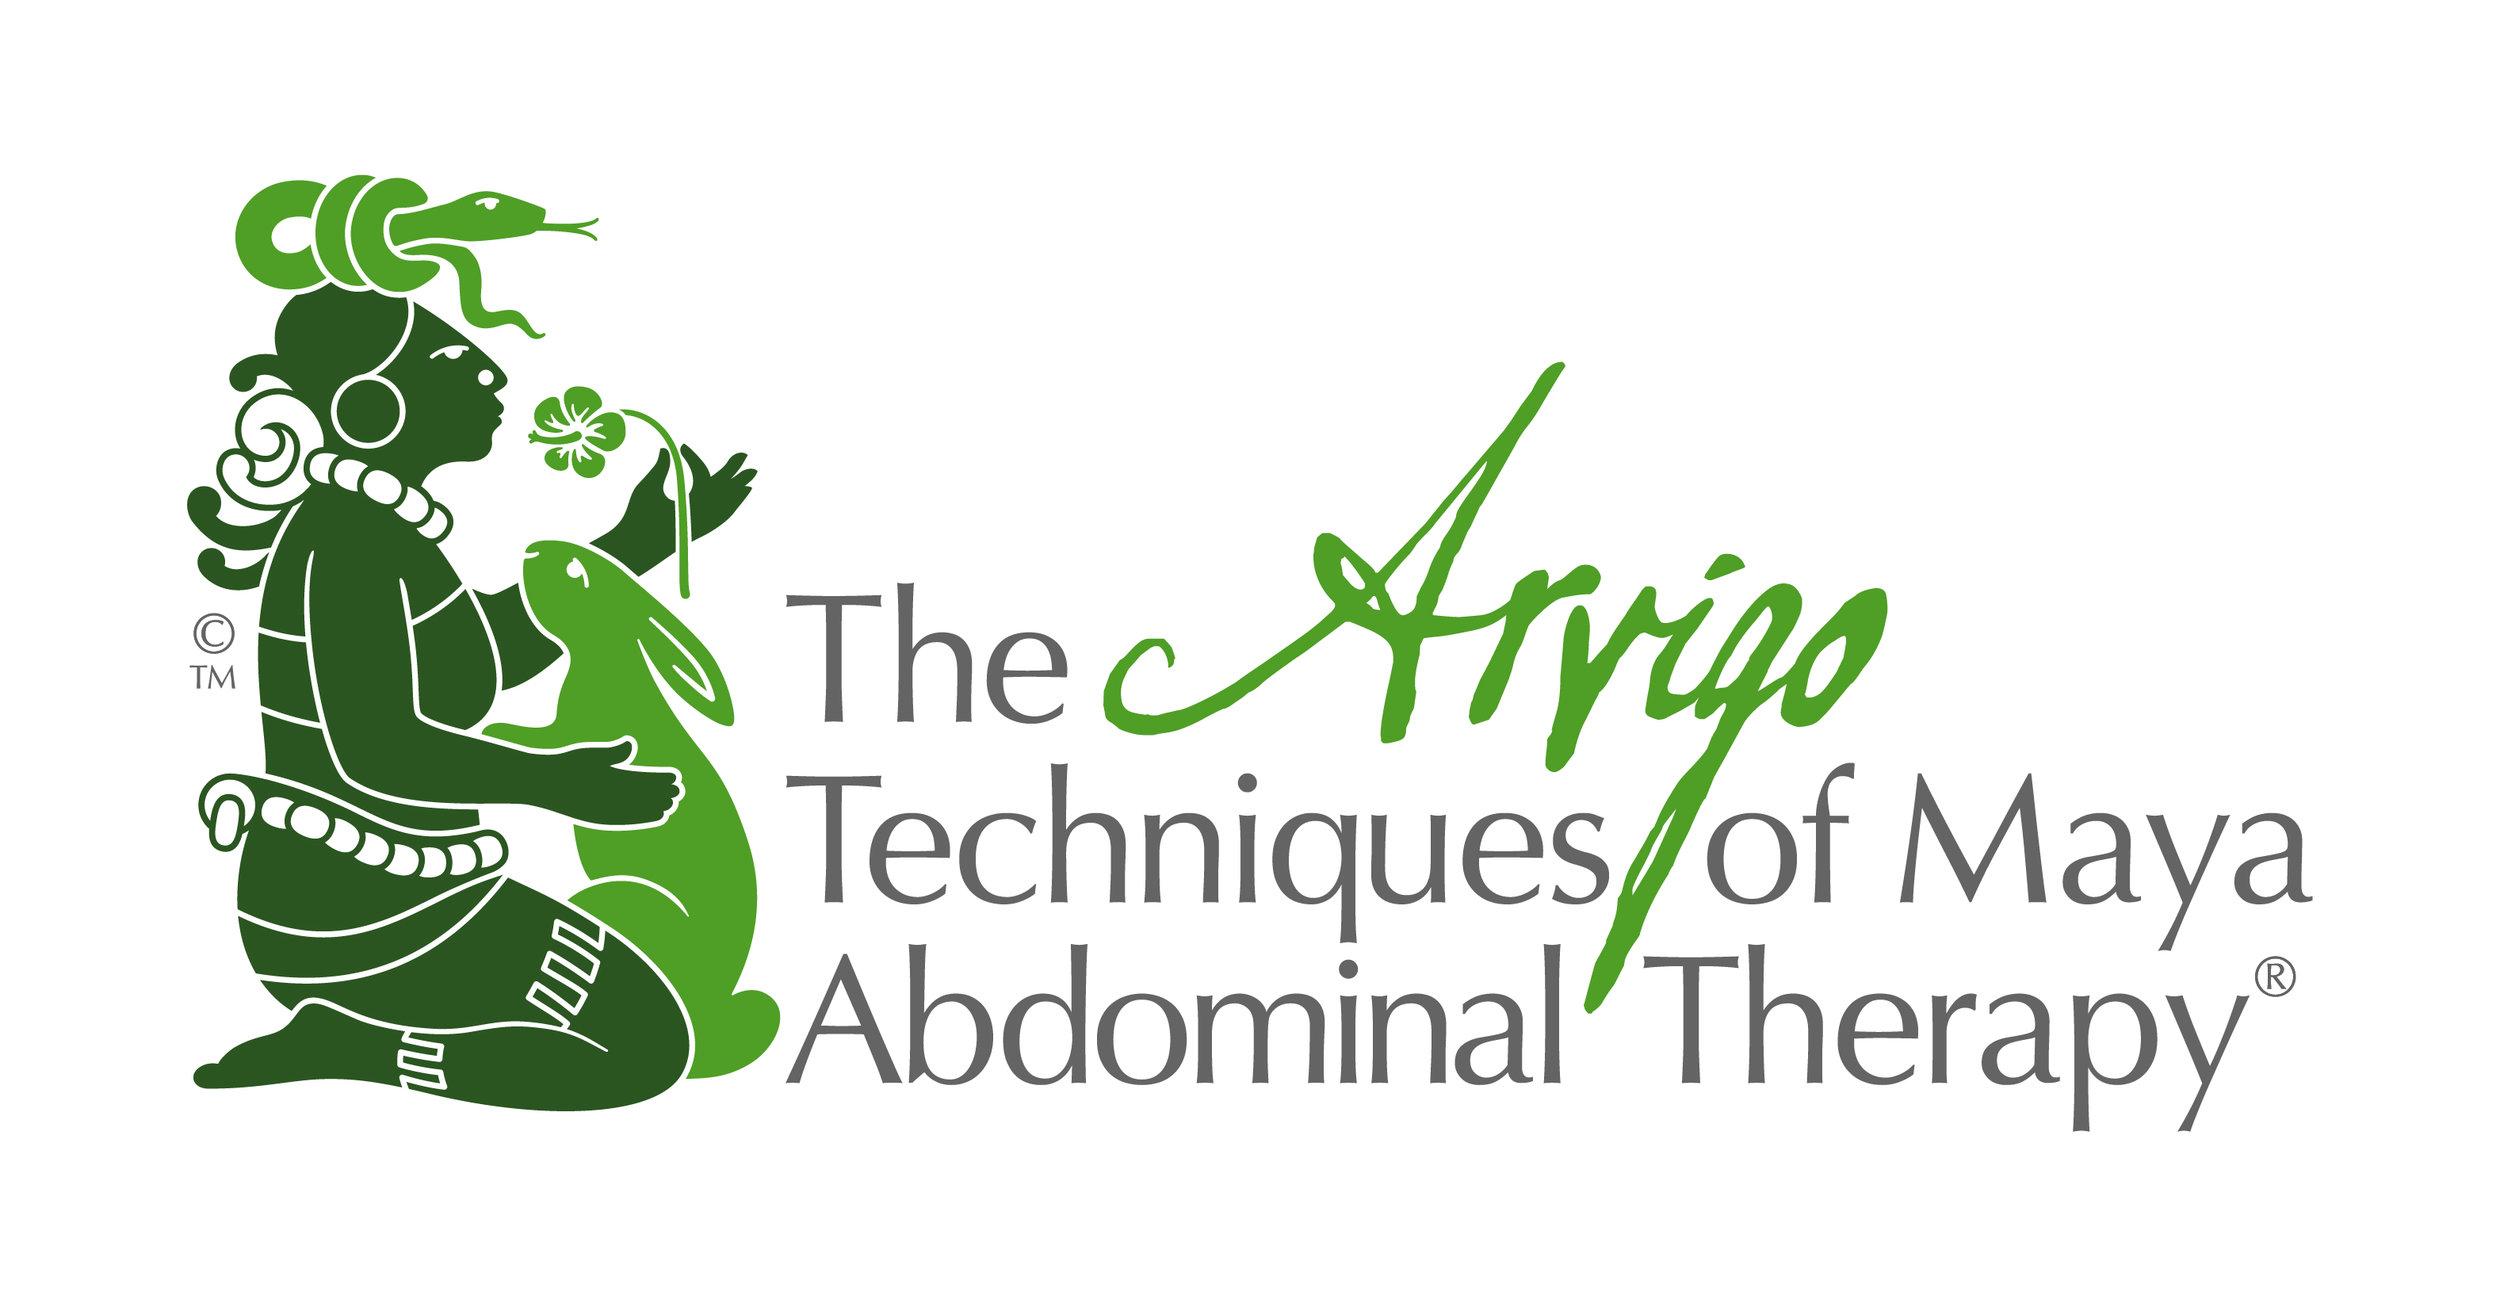 the_arvigo_techniques_of_maya_abdominal_therapy_color_horizontal_logotrademark.jpg